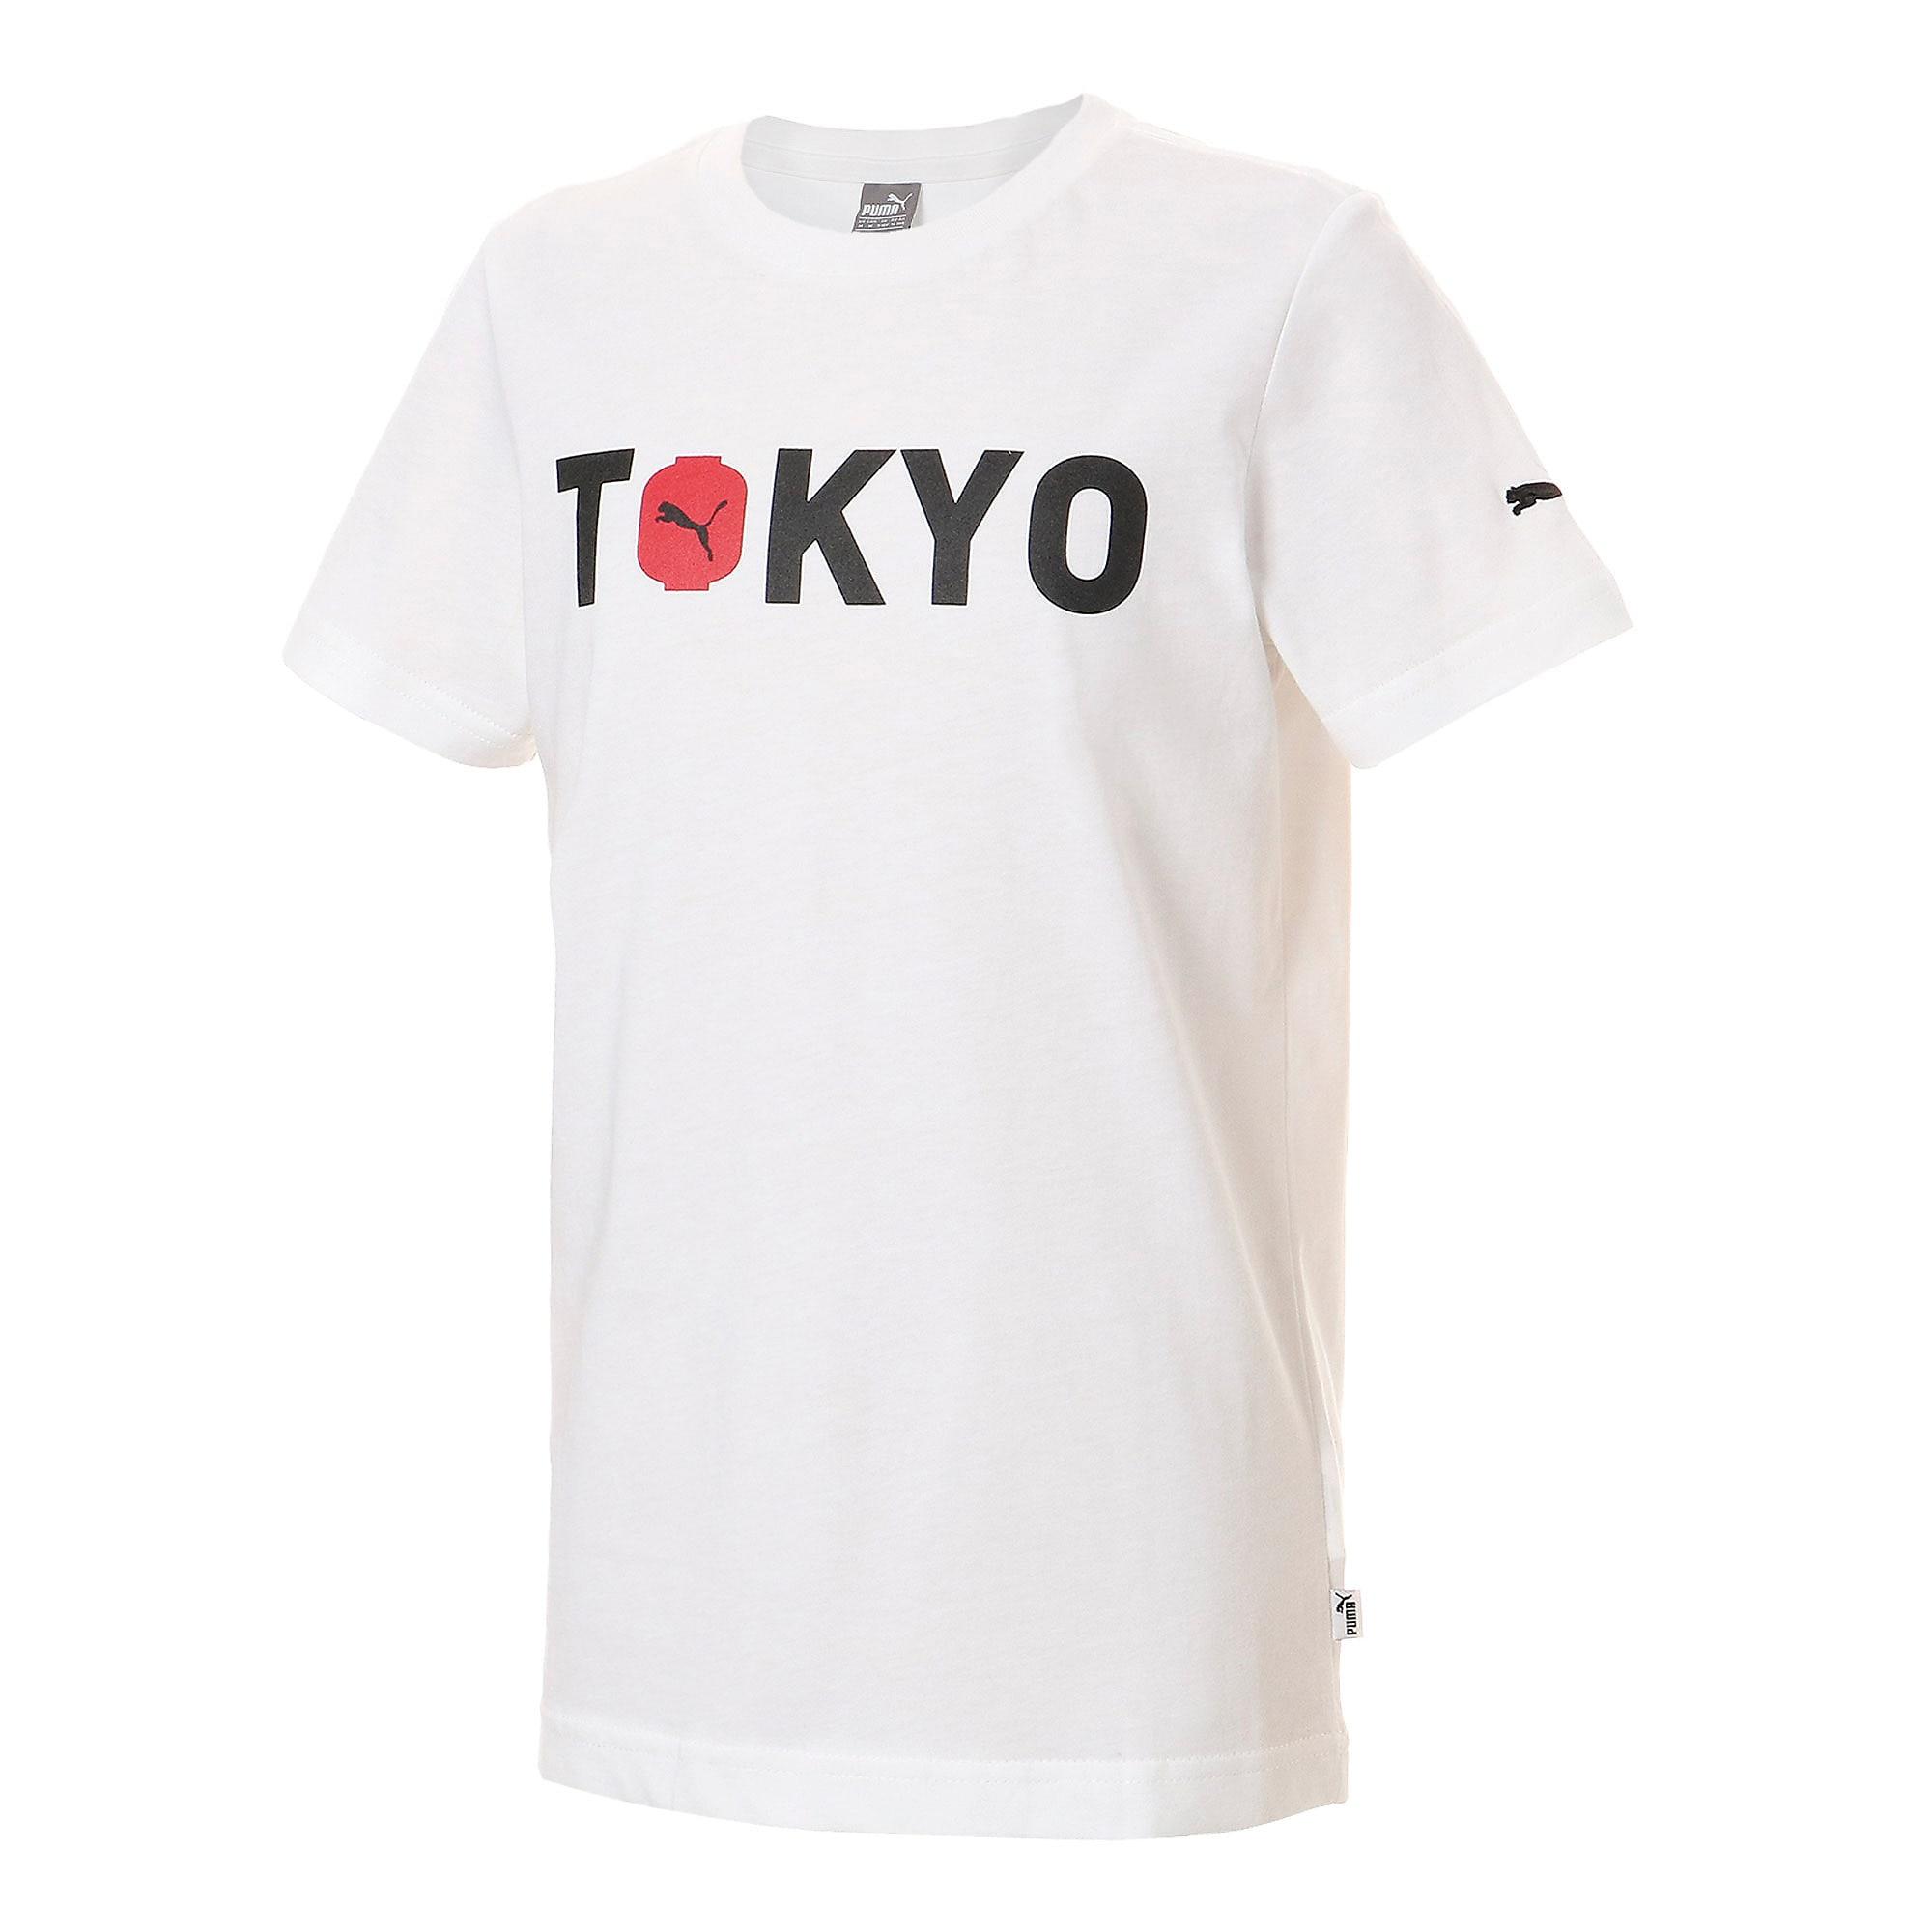 Thumbnail 1 of キッズ シティー 半袖 Tシャツ TOKYO 東京, Puma White, medium-JPN